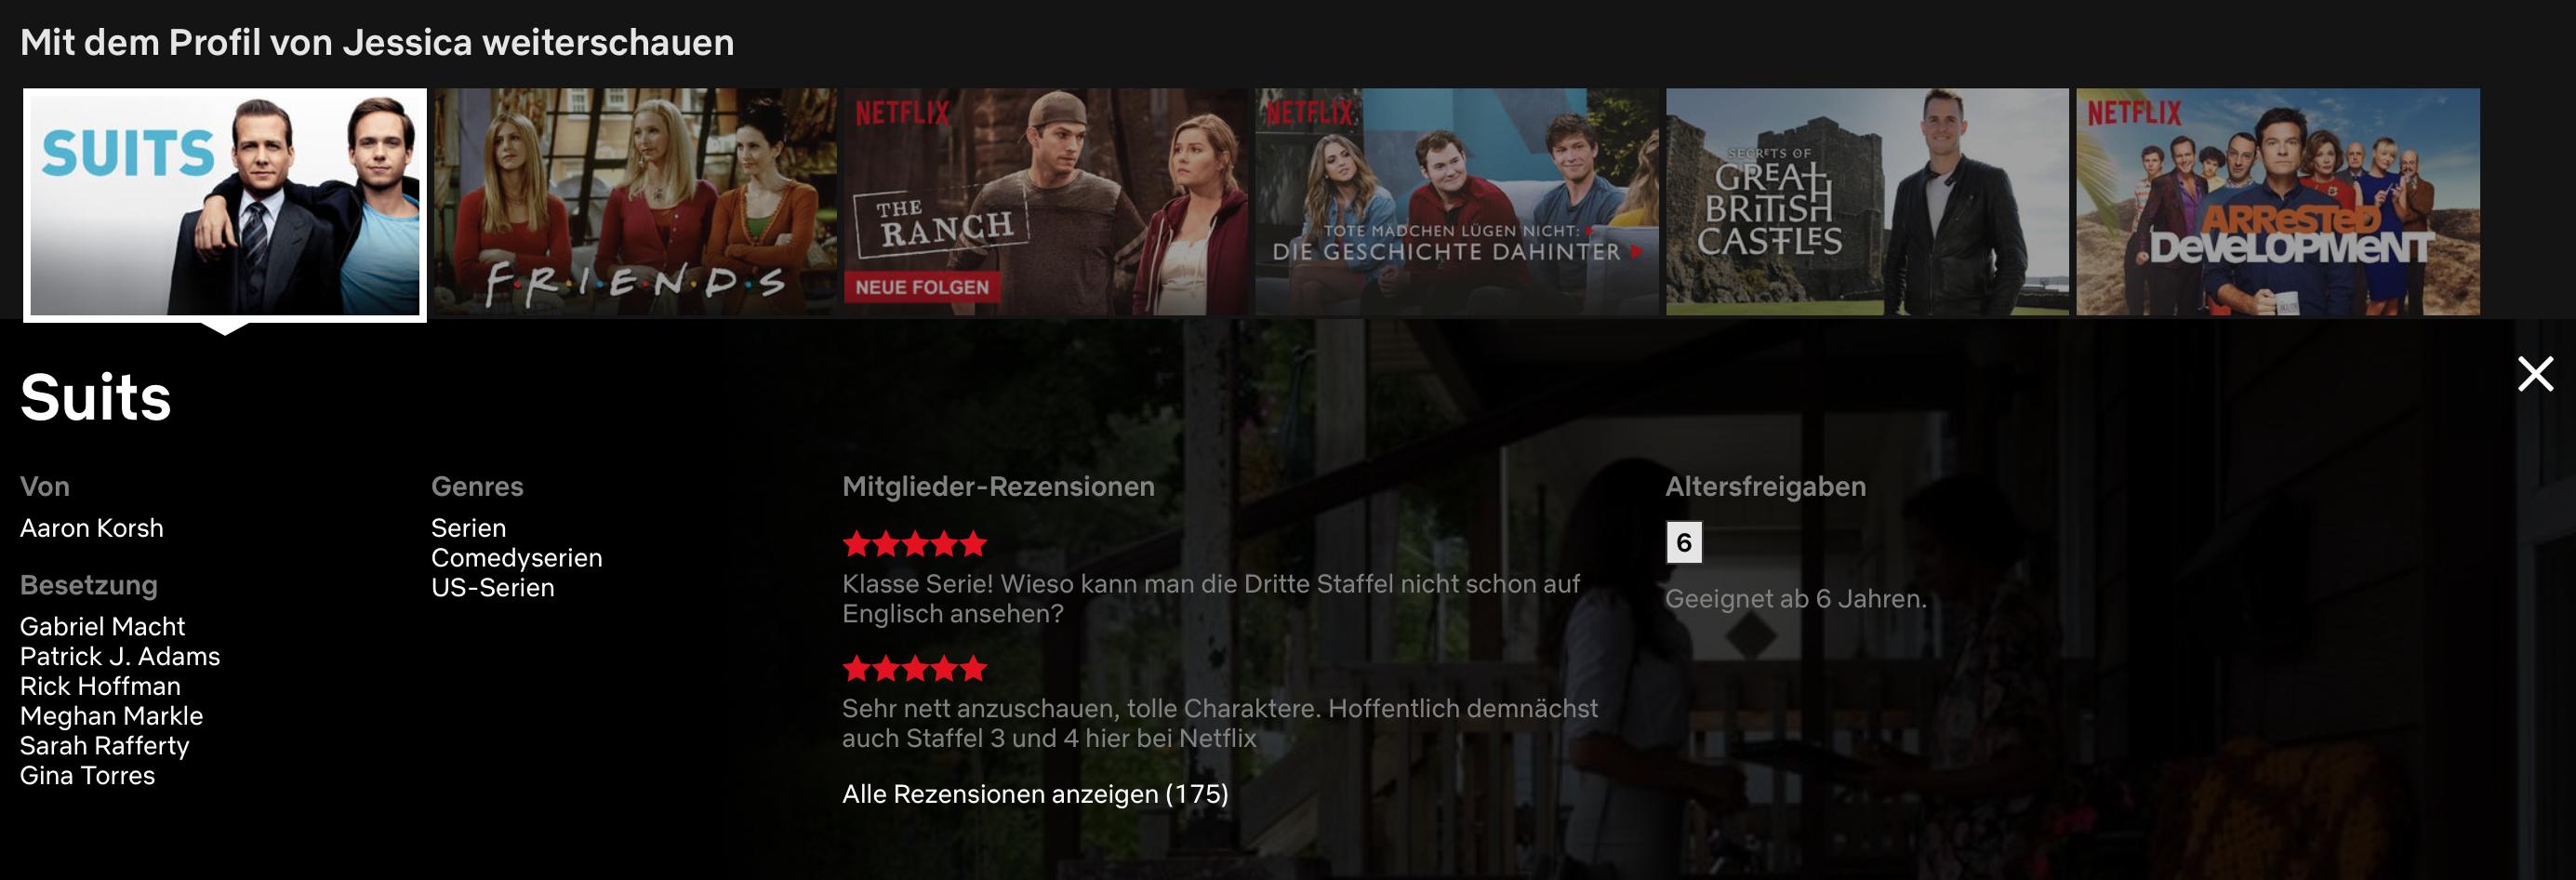 Netflix: Streaming-Dienst schafft Rezensionen ab | handy.de